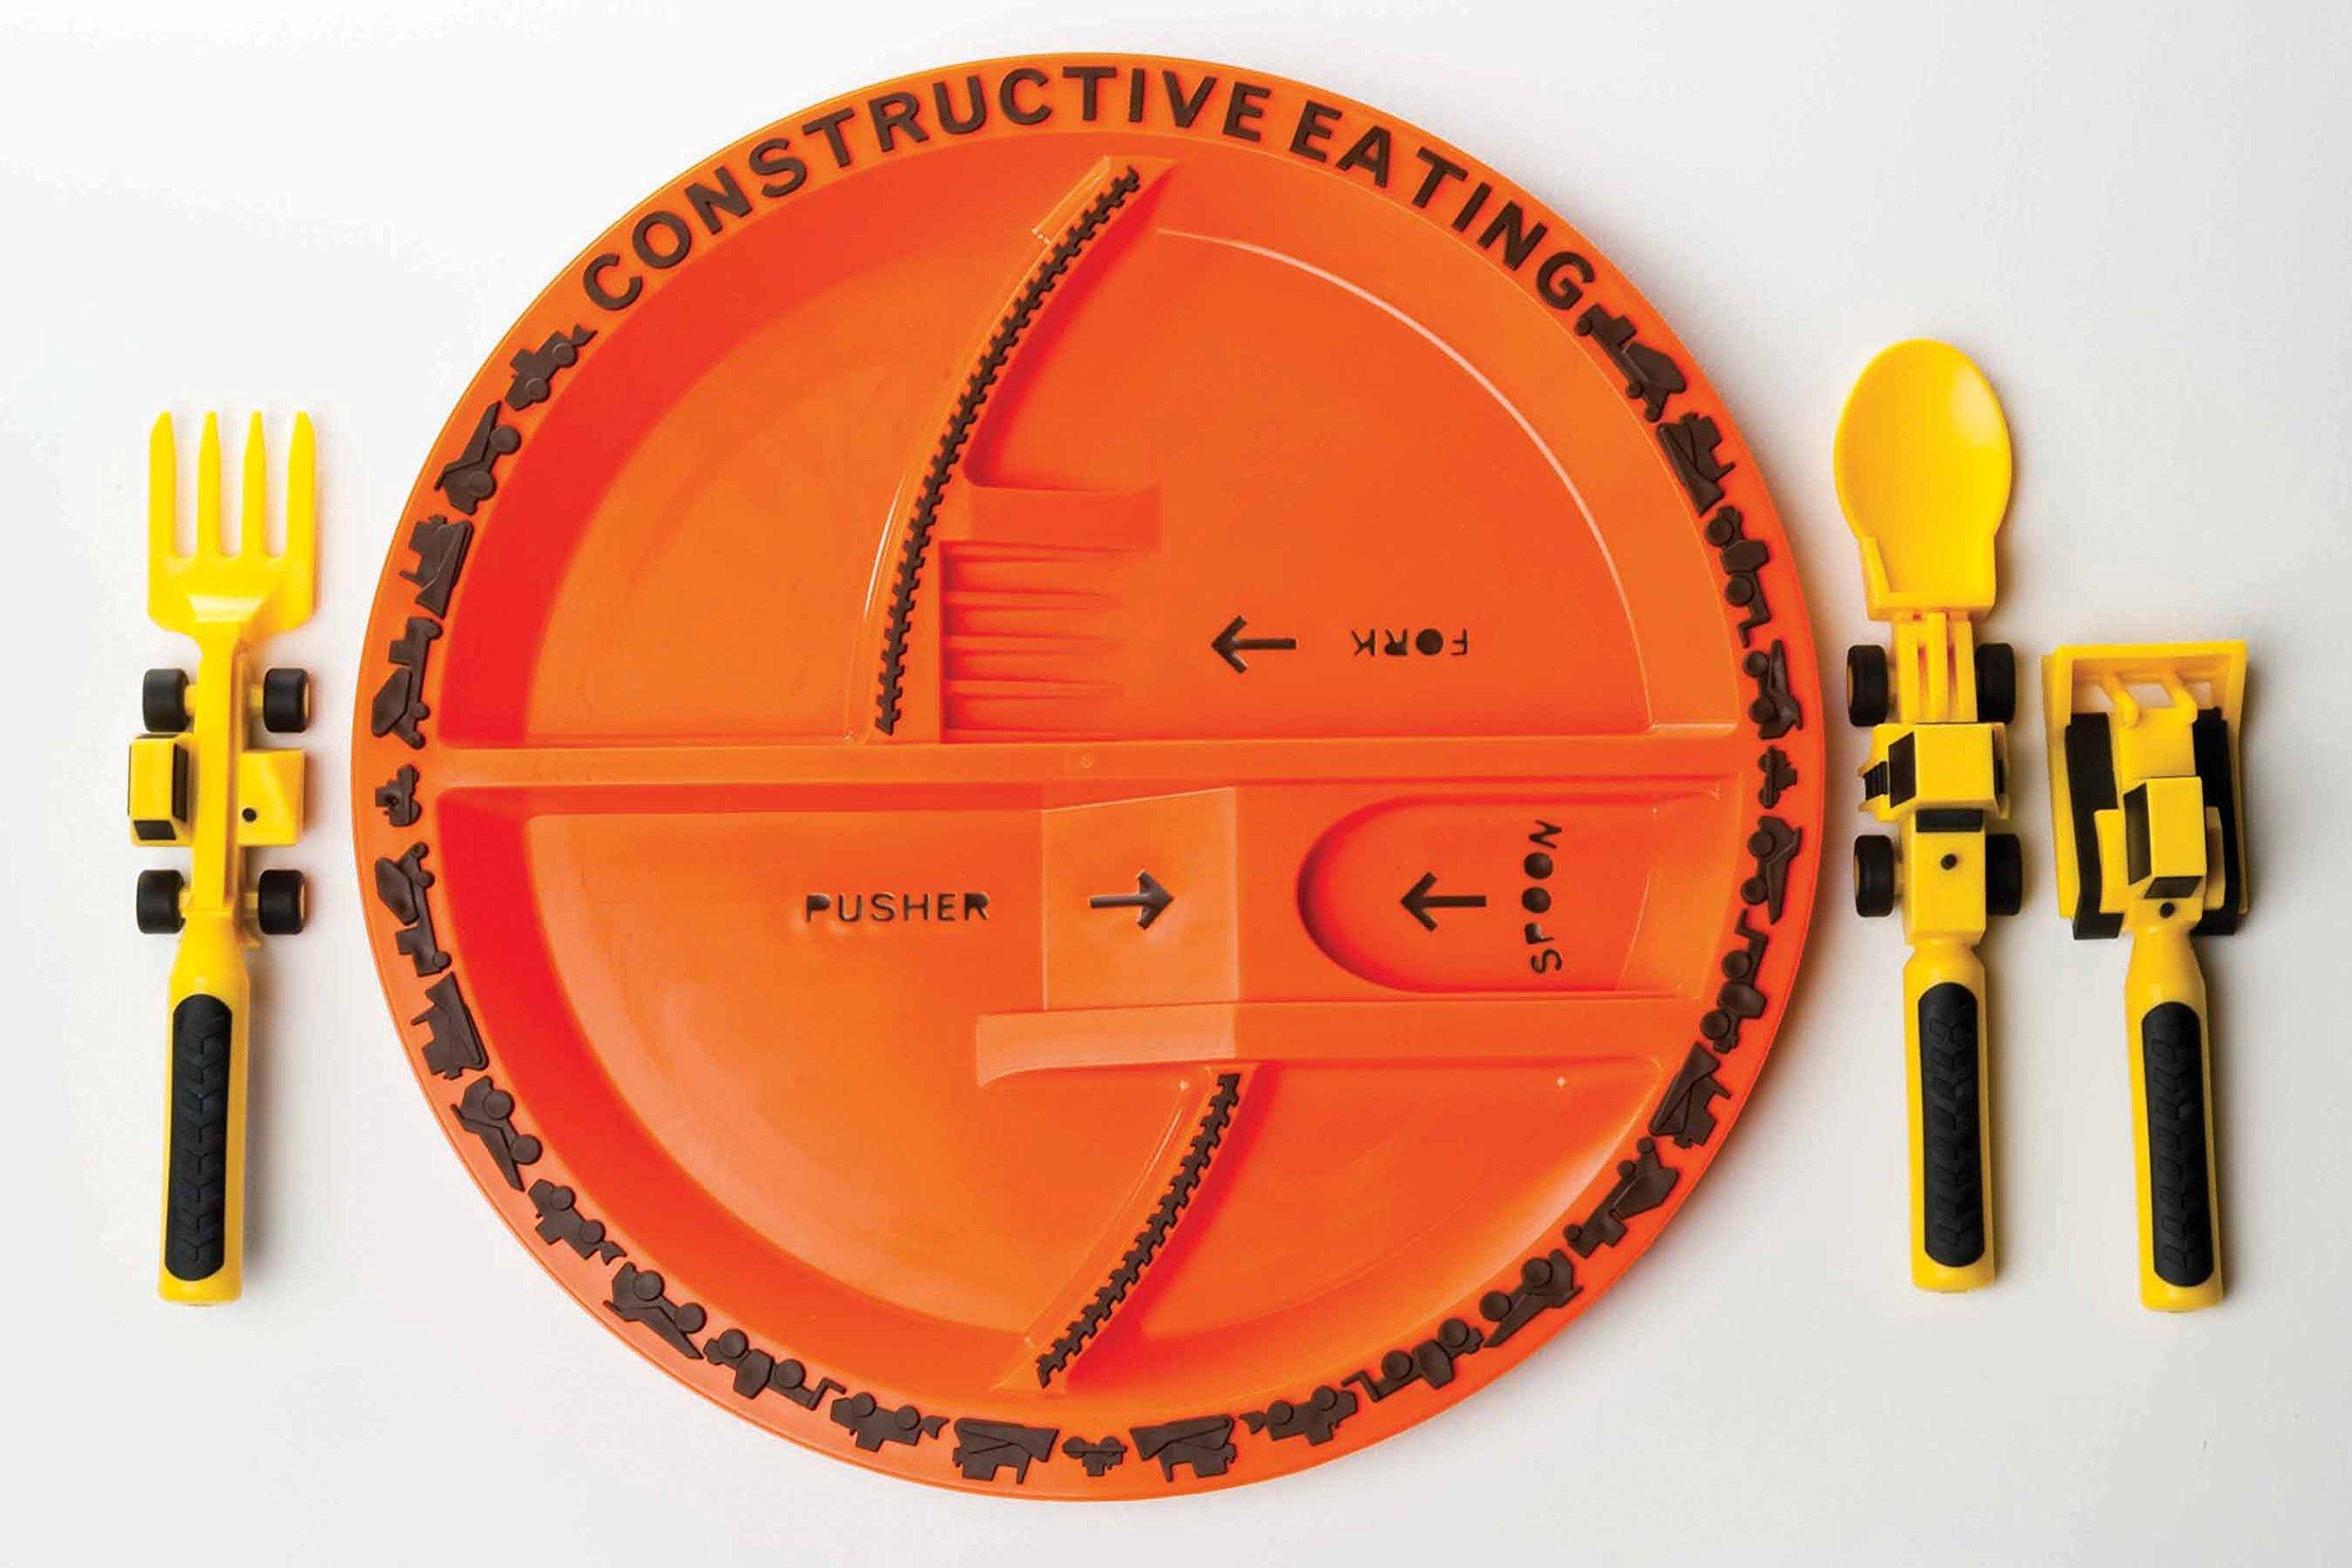 Constructive Eating - Construction Utensil Set with Construction Plate & Constructive Eating - Construction Utensil Set with Construction ...